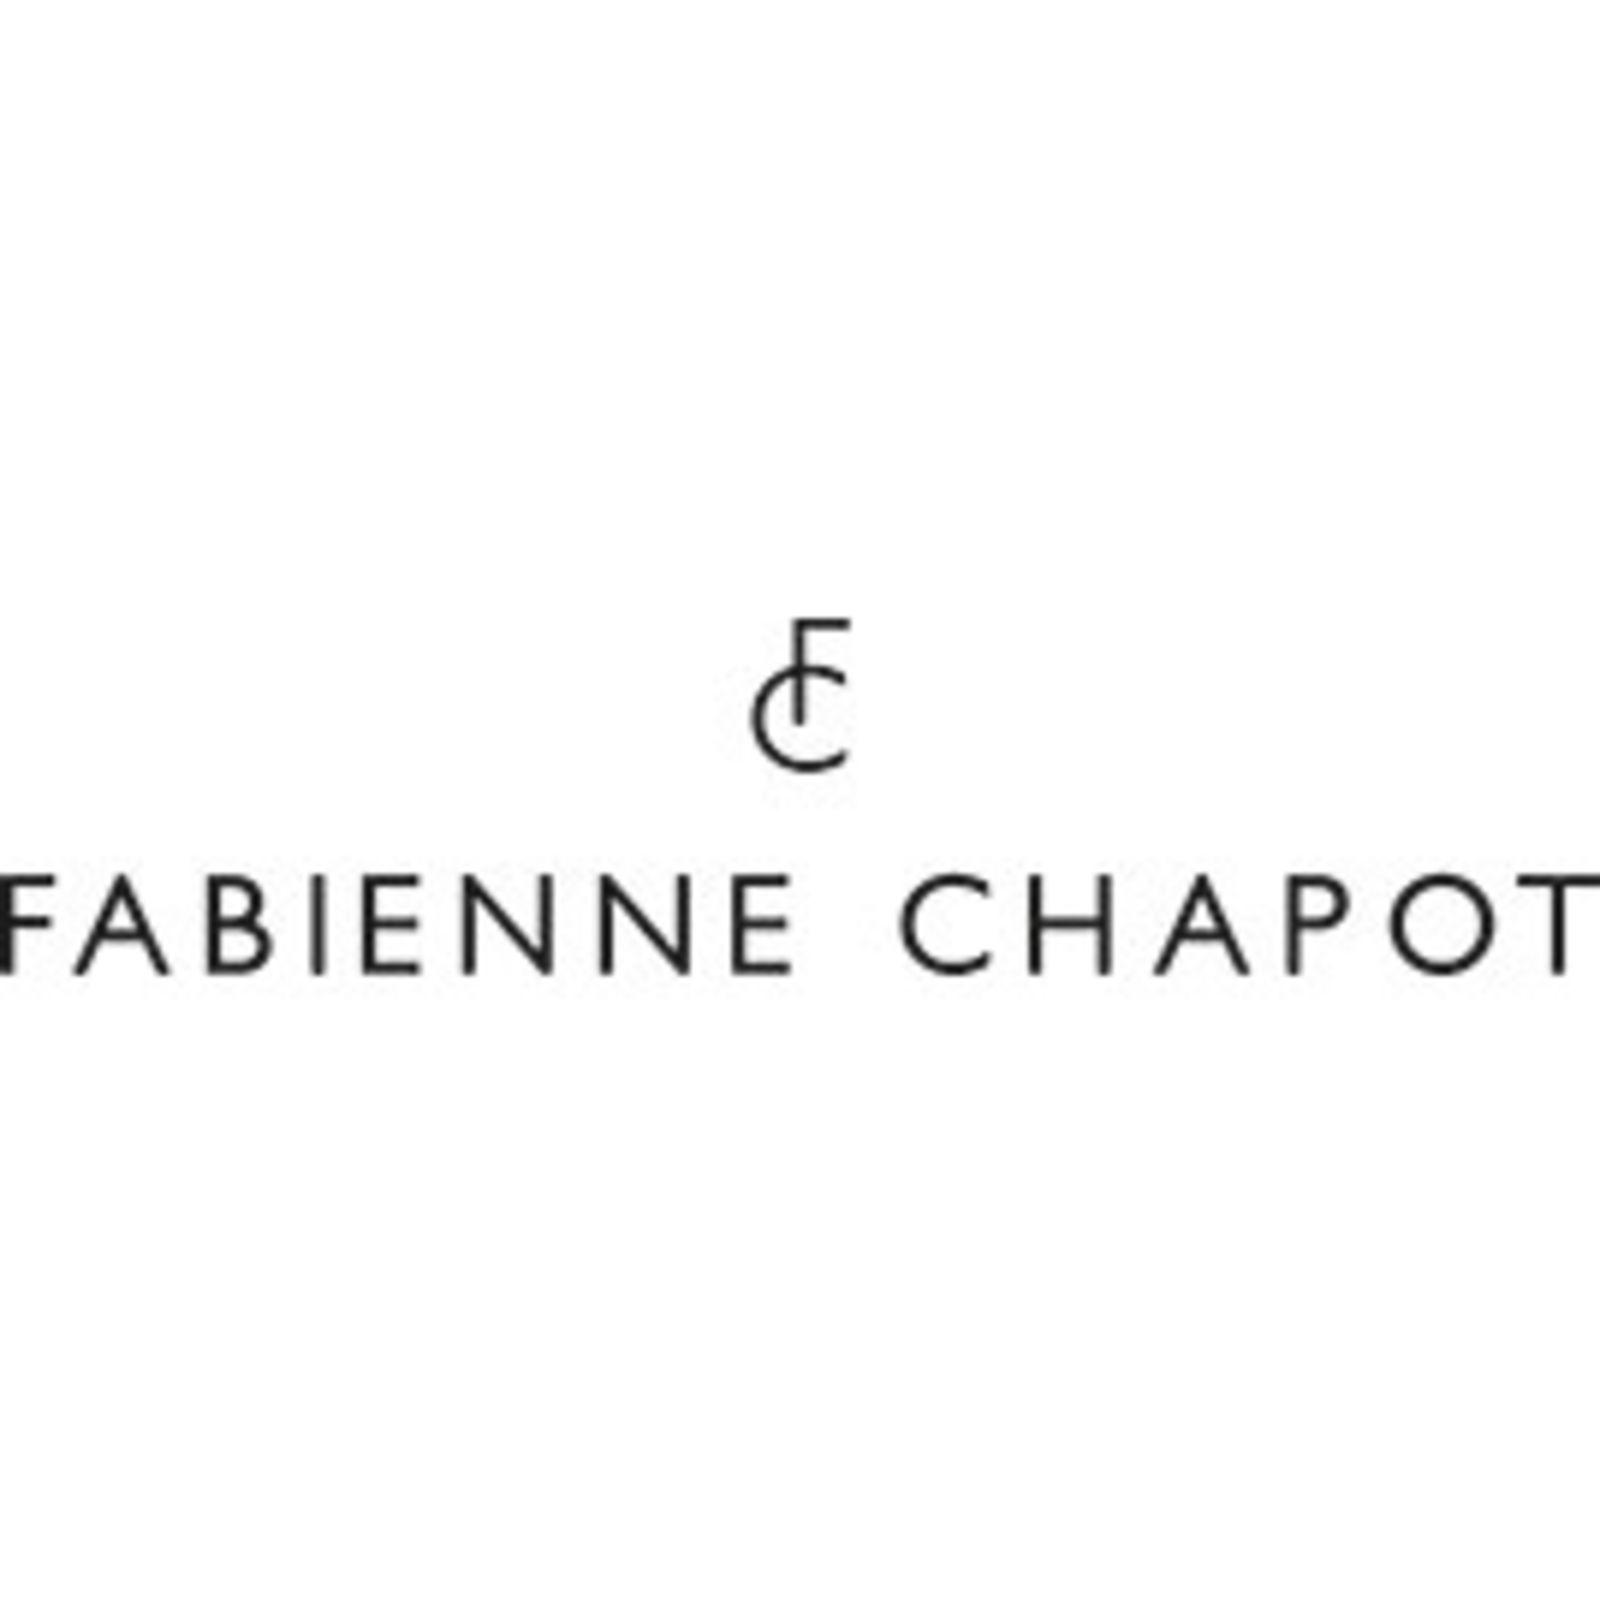 FABIENNE CHAPOT (Bild 1)